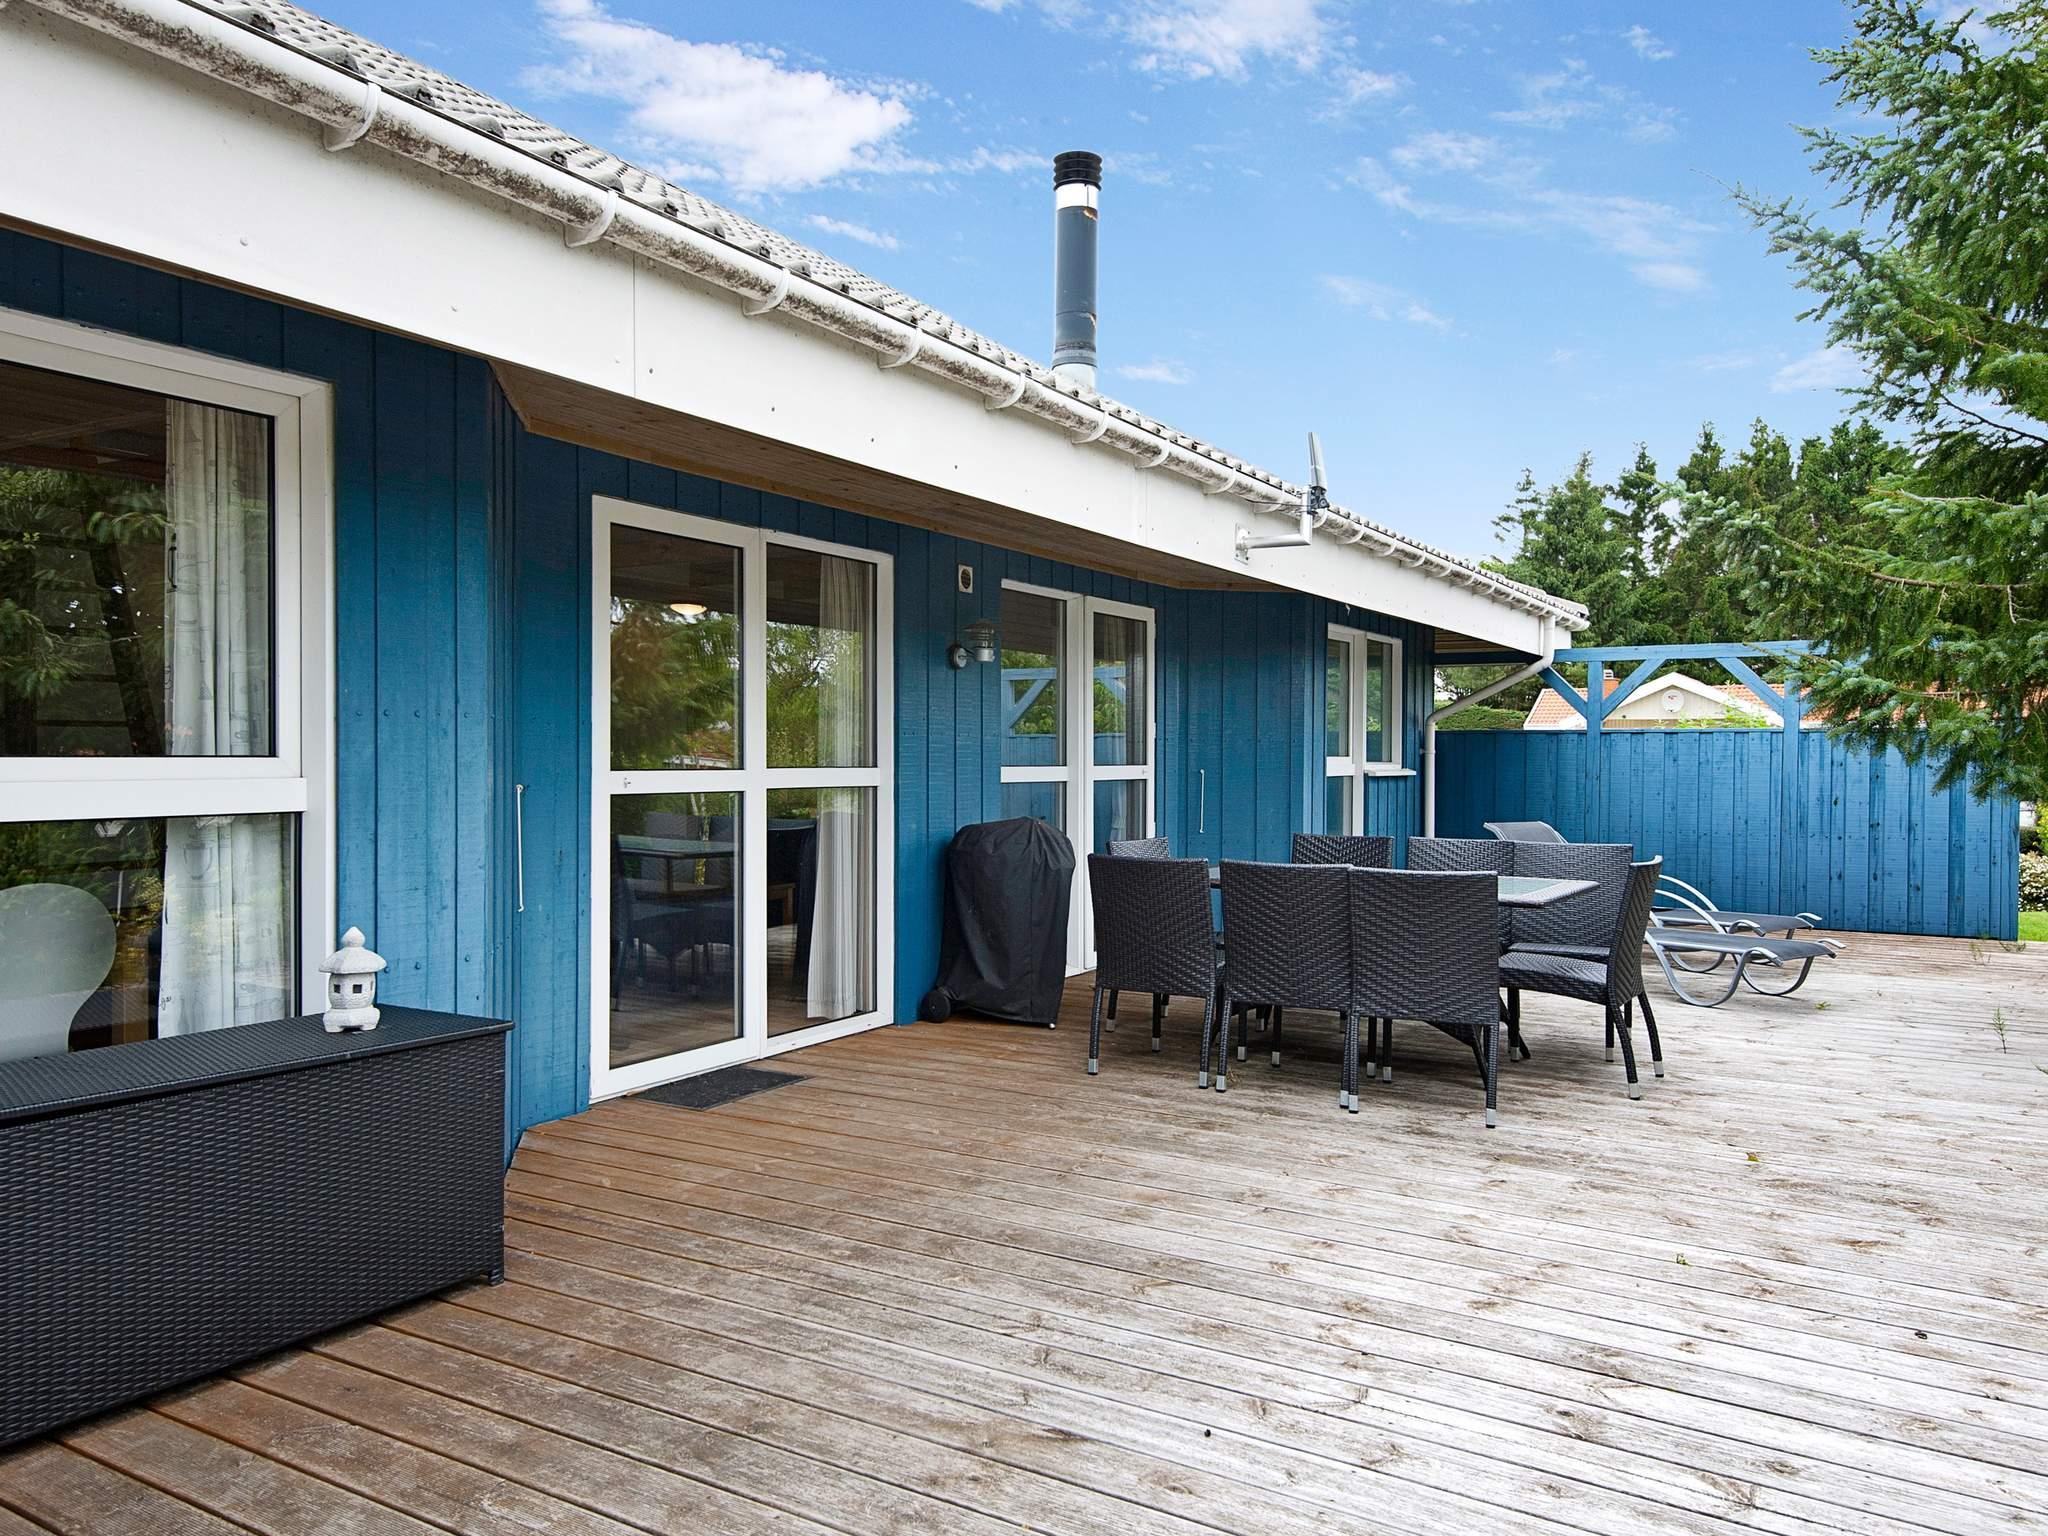 Ferienhaus Hejlsminde Strand (85687), Hejls, , Südostjütland, Dänemark, Bild 15